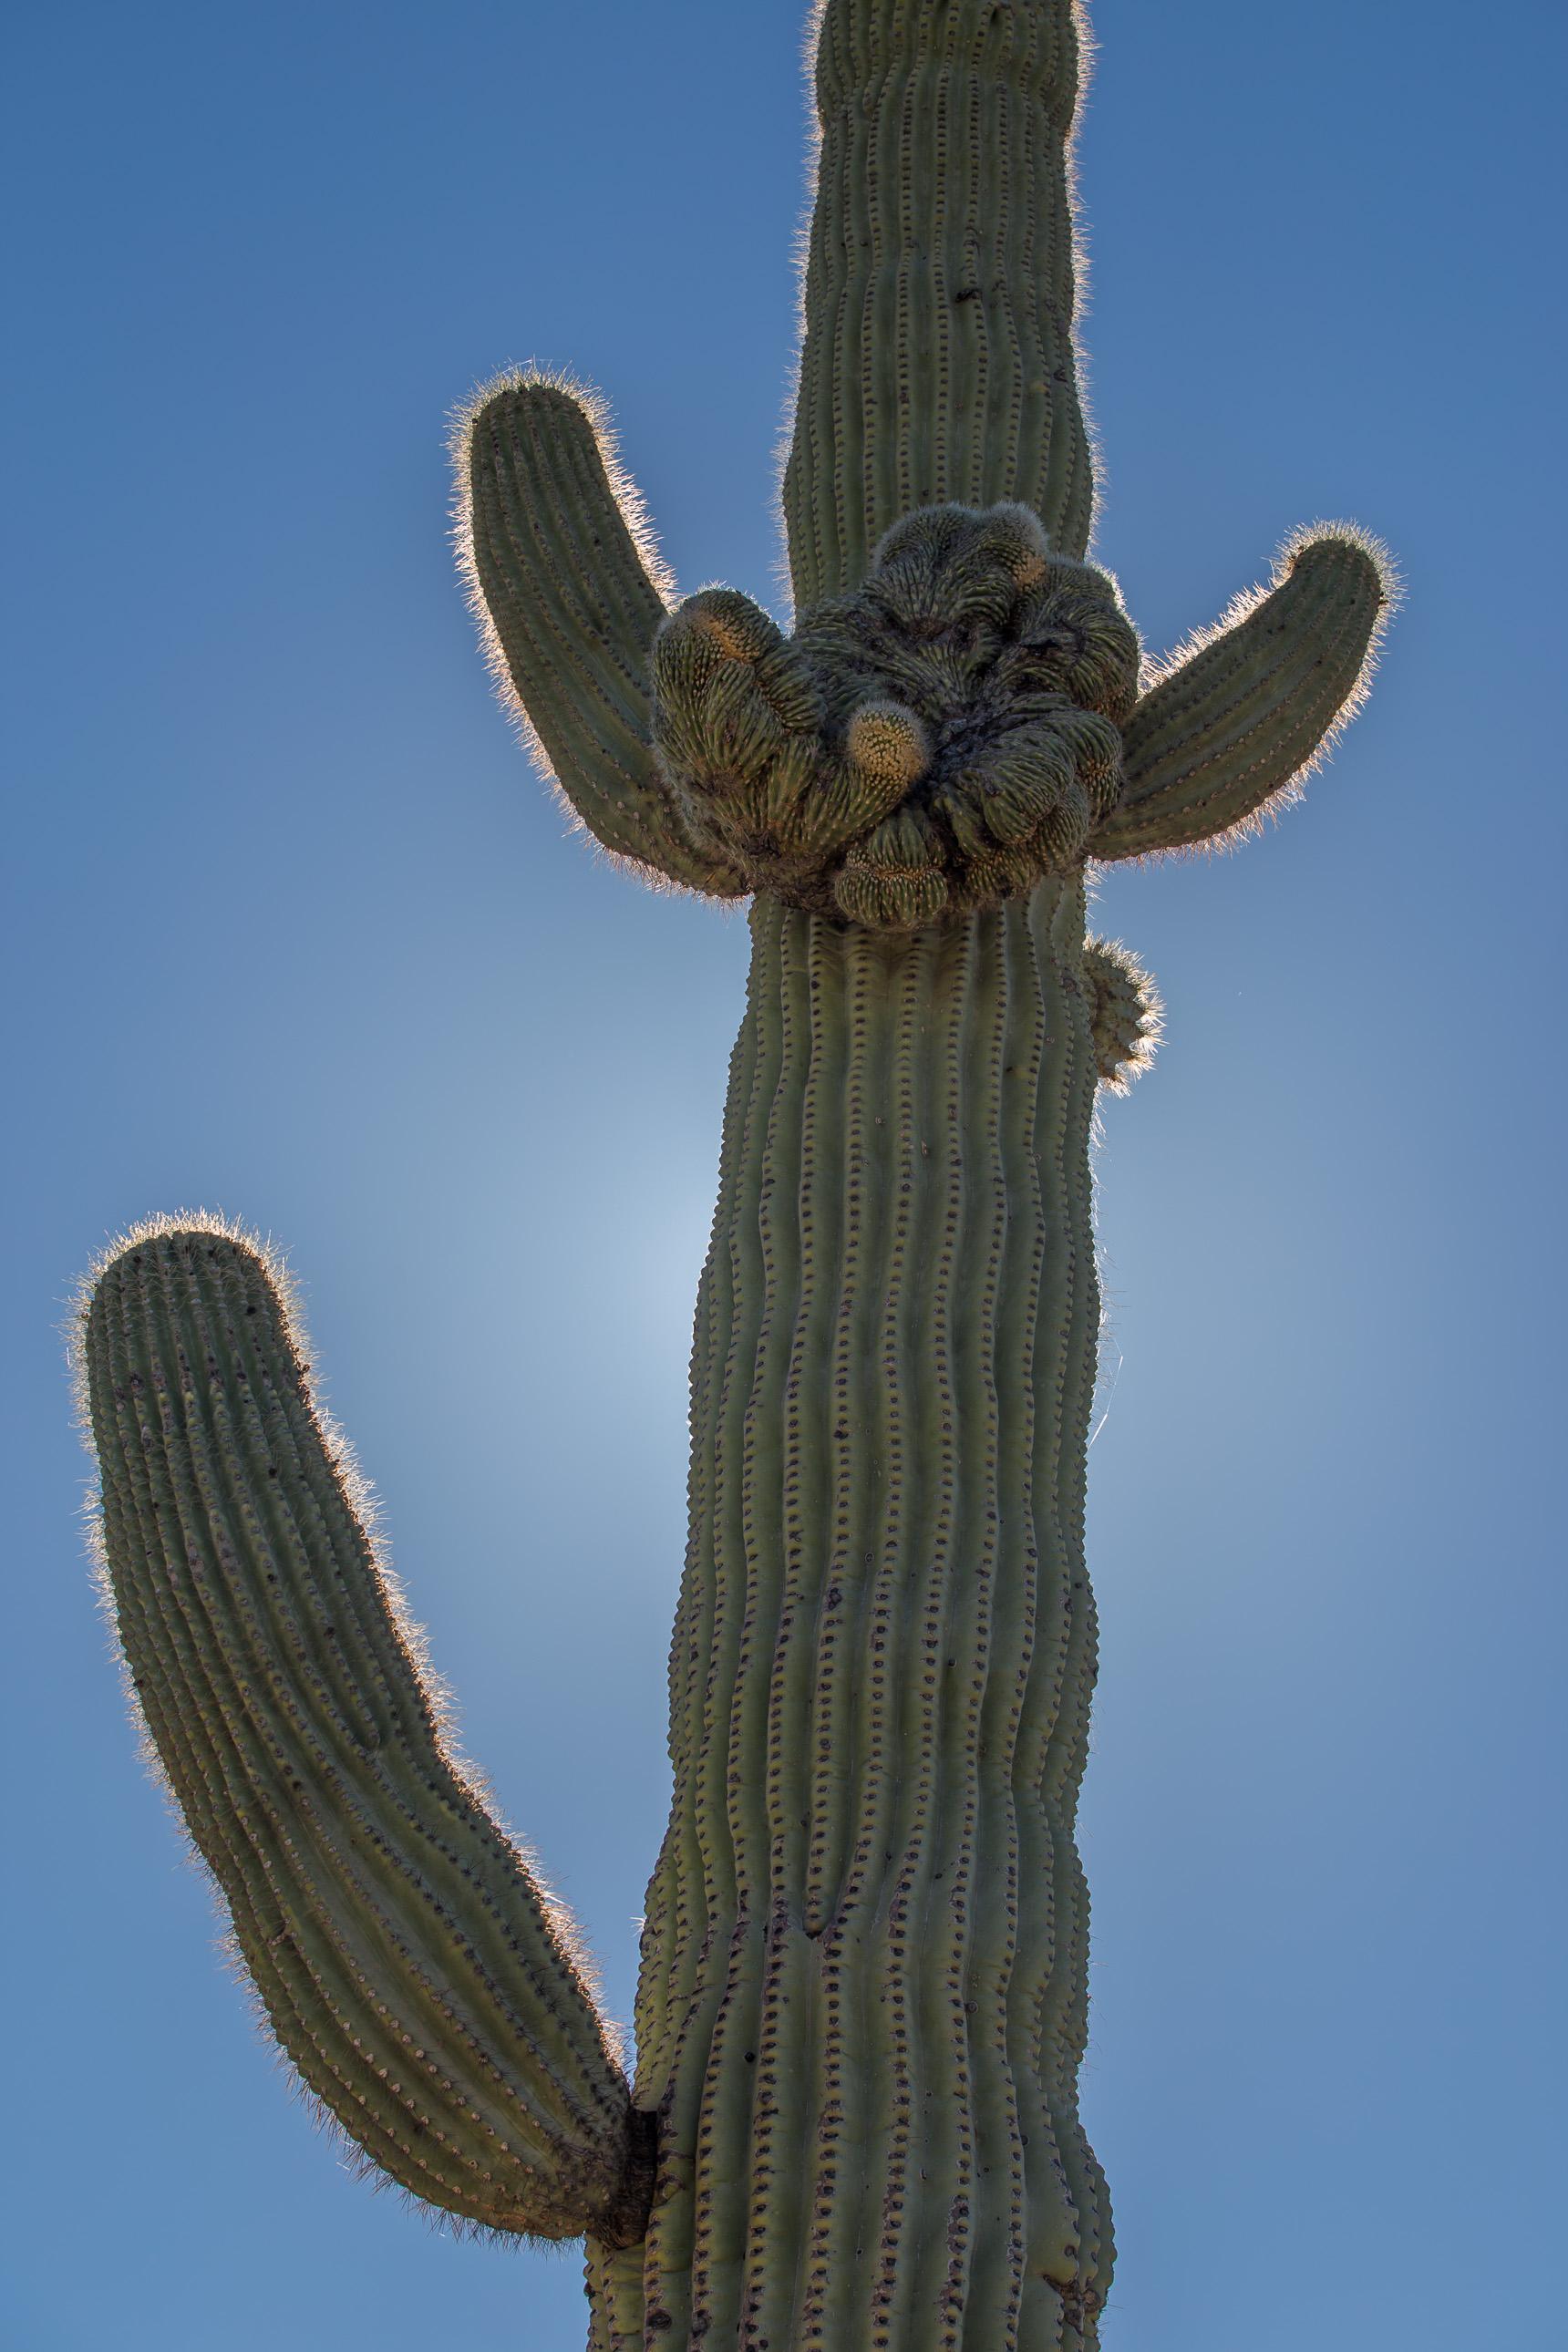 Crested saguaro cactus on Puerto Blanco Road